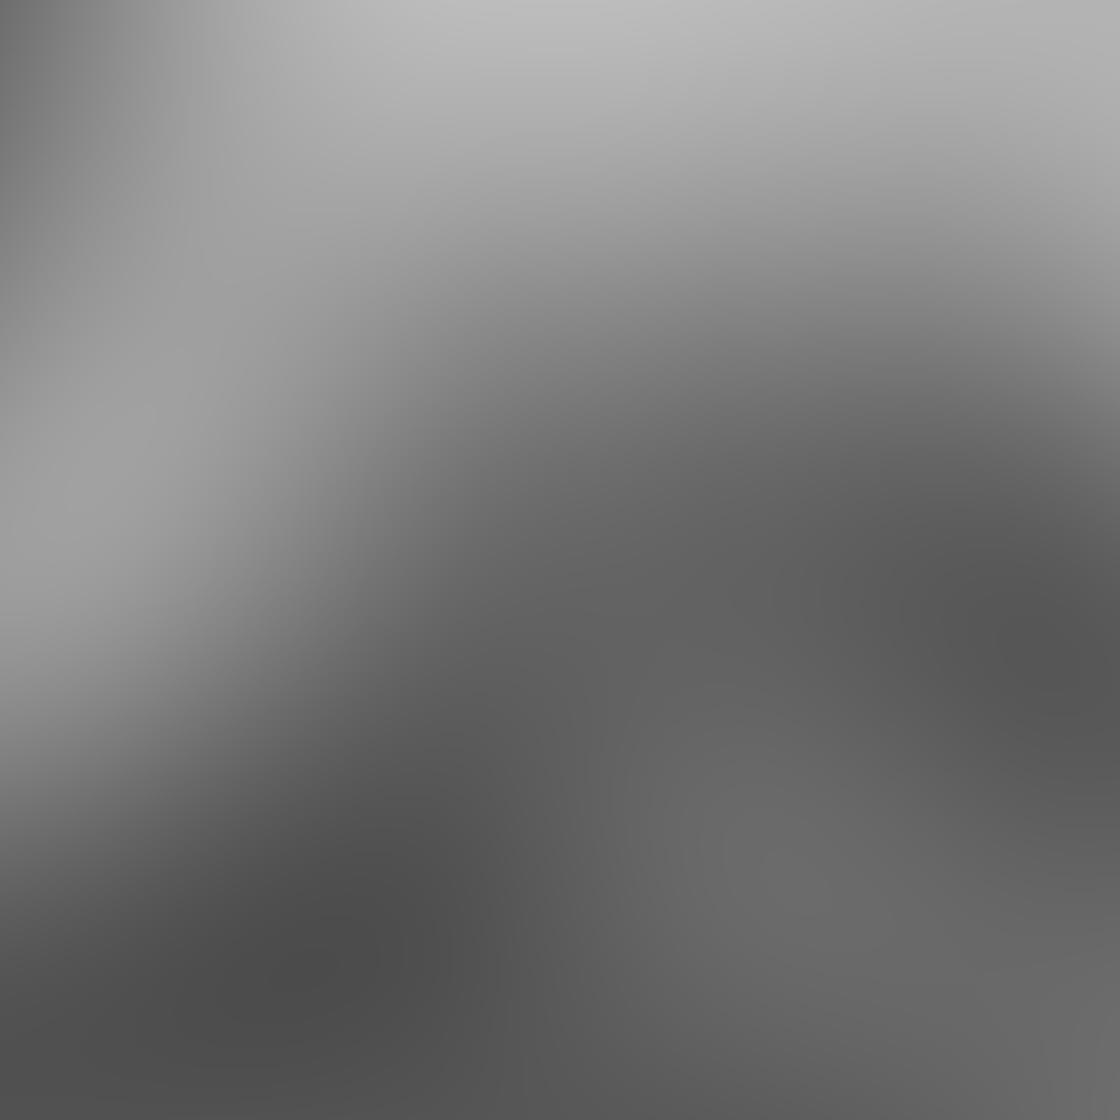 iPhone Photo Shadows 23